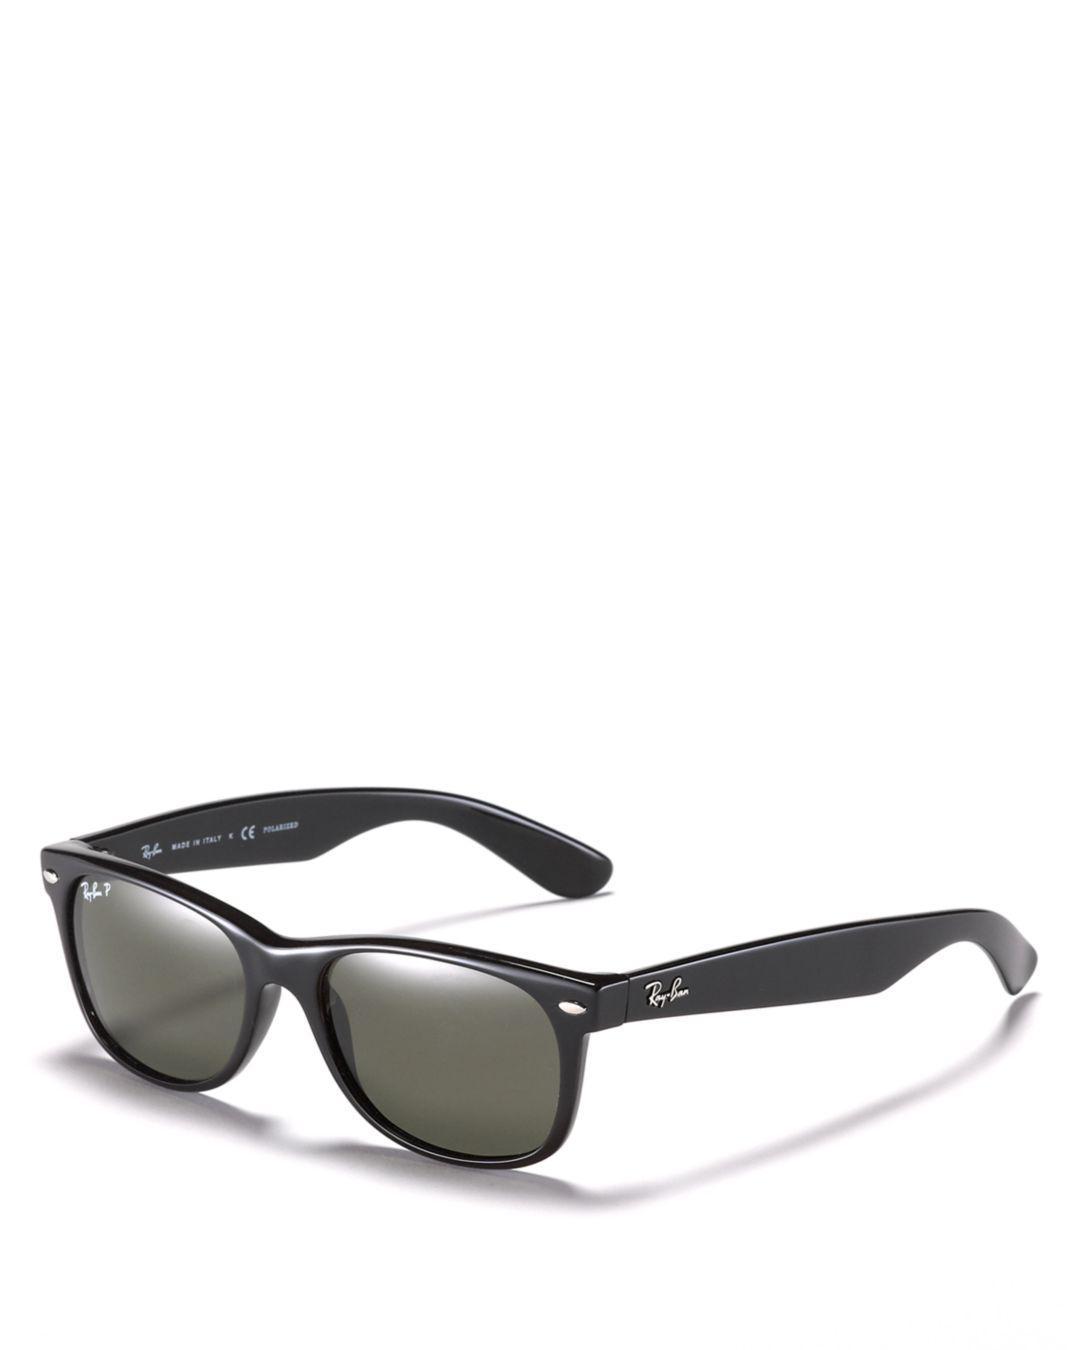 fac3251d311fa Lyst - Ray-Ban New Wayfarer Polarized Sunglasses in Black